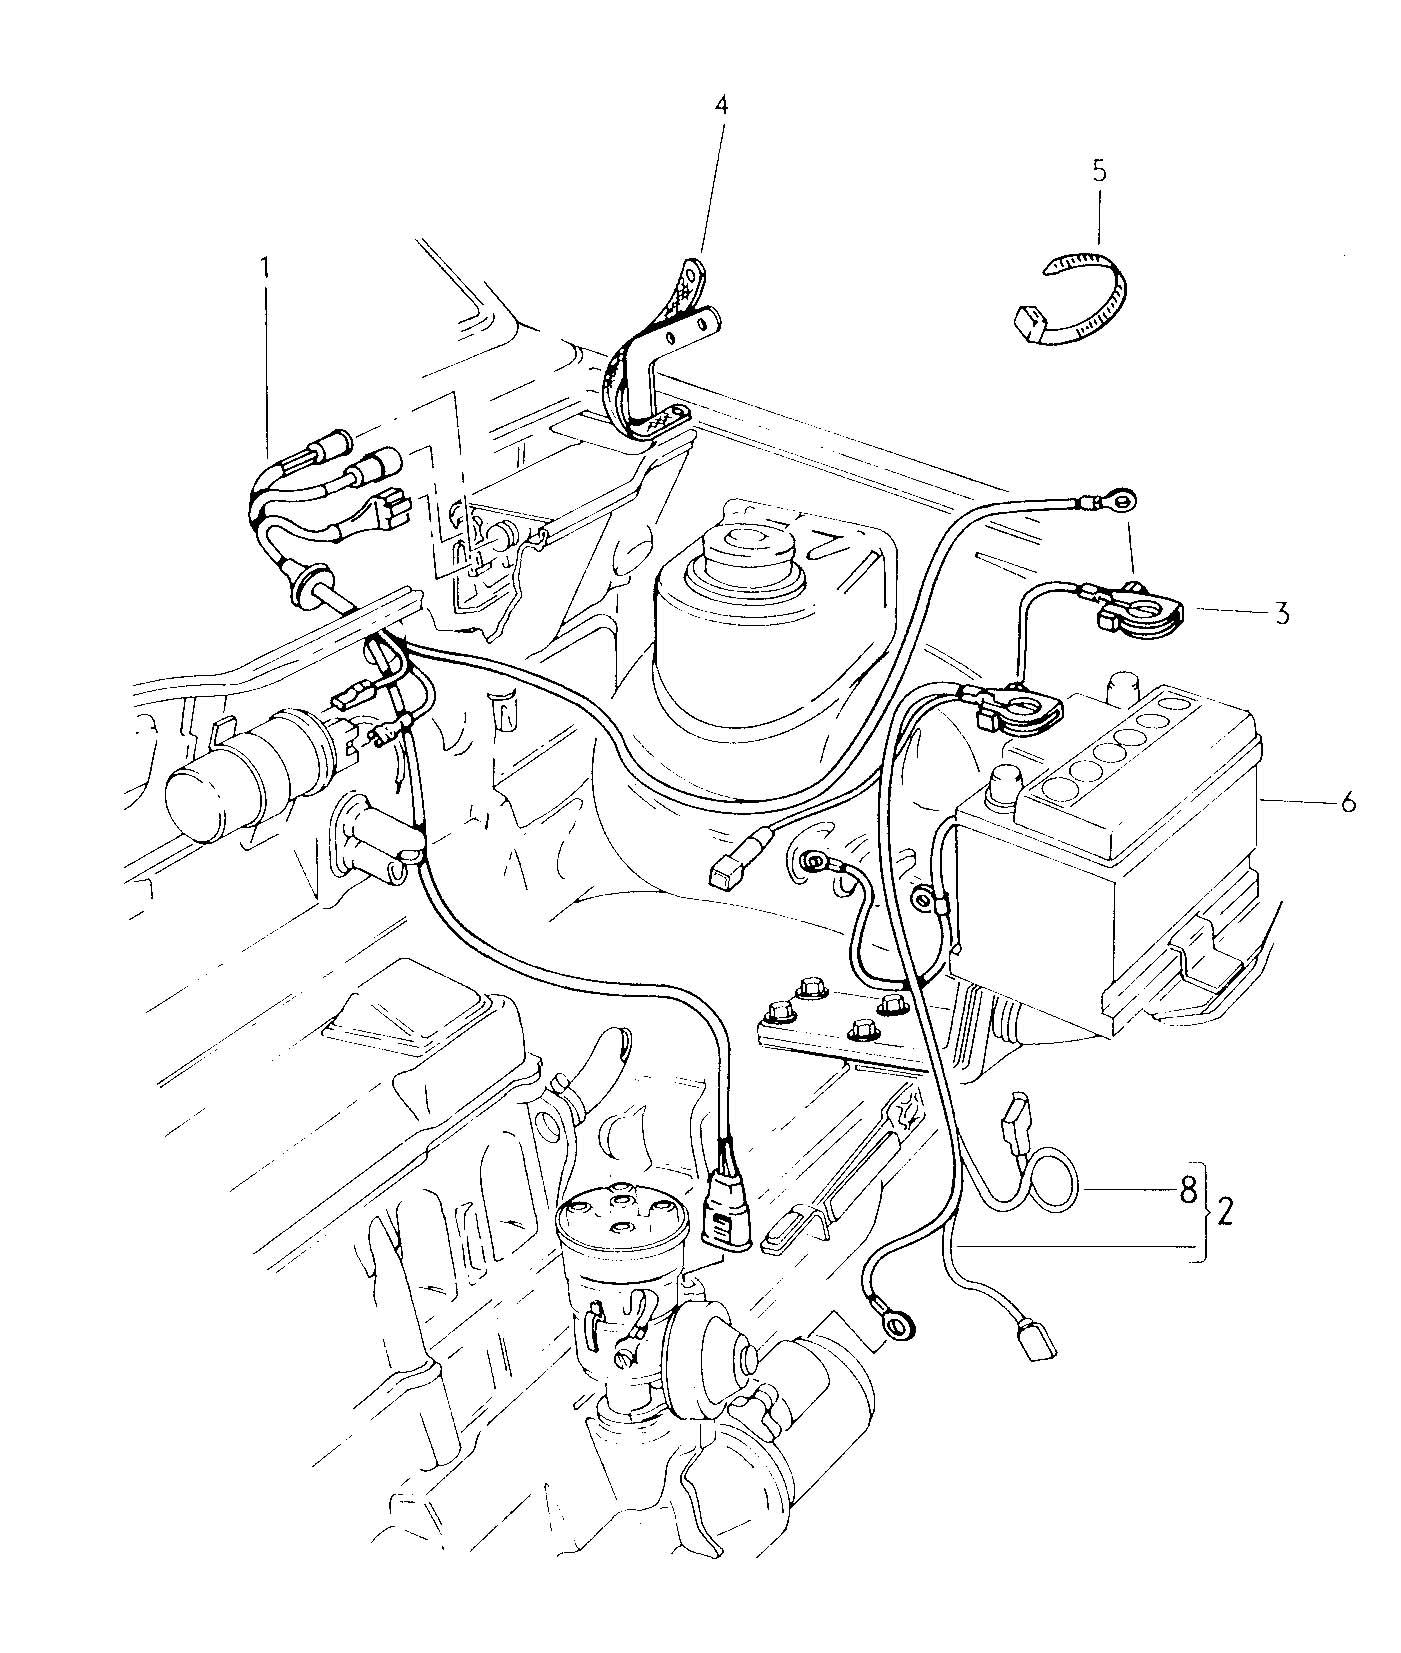 Vw Rabbit Parts Diagram. Wiring. Auto Wiring Diagram